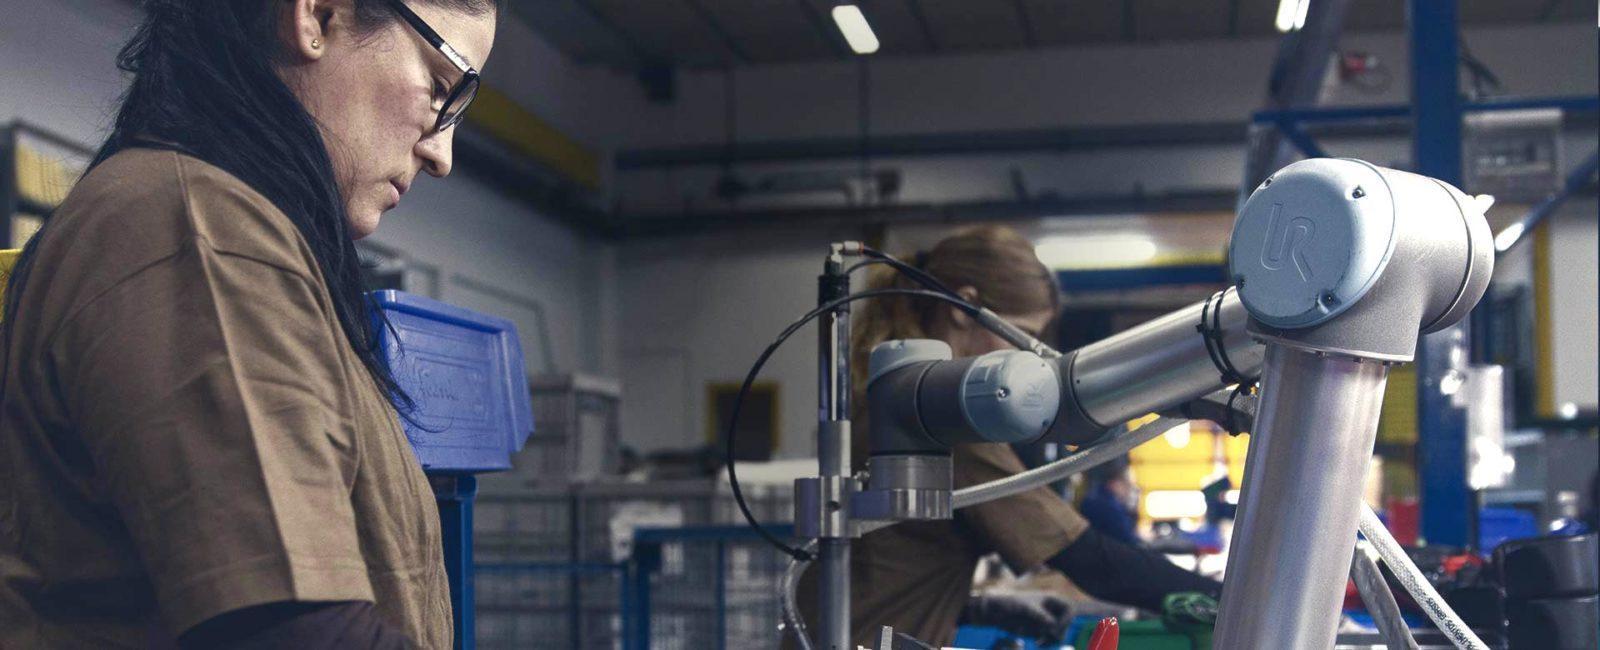 robot atornillador colaborativo cade cobots